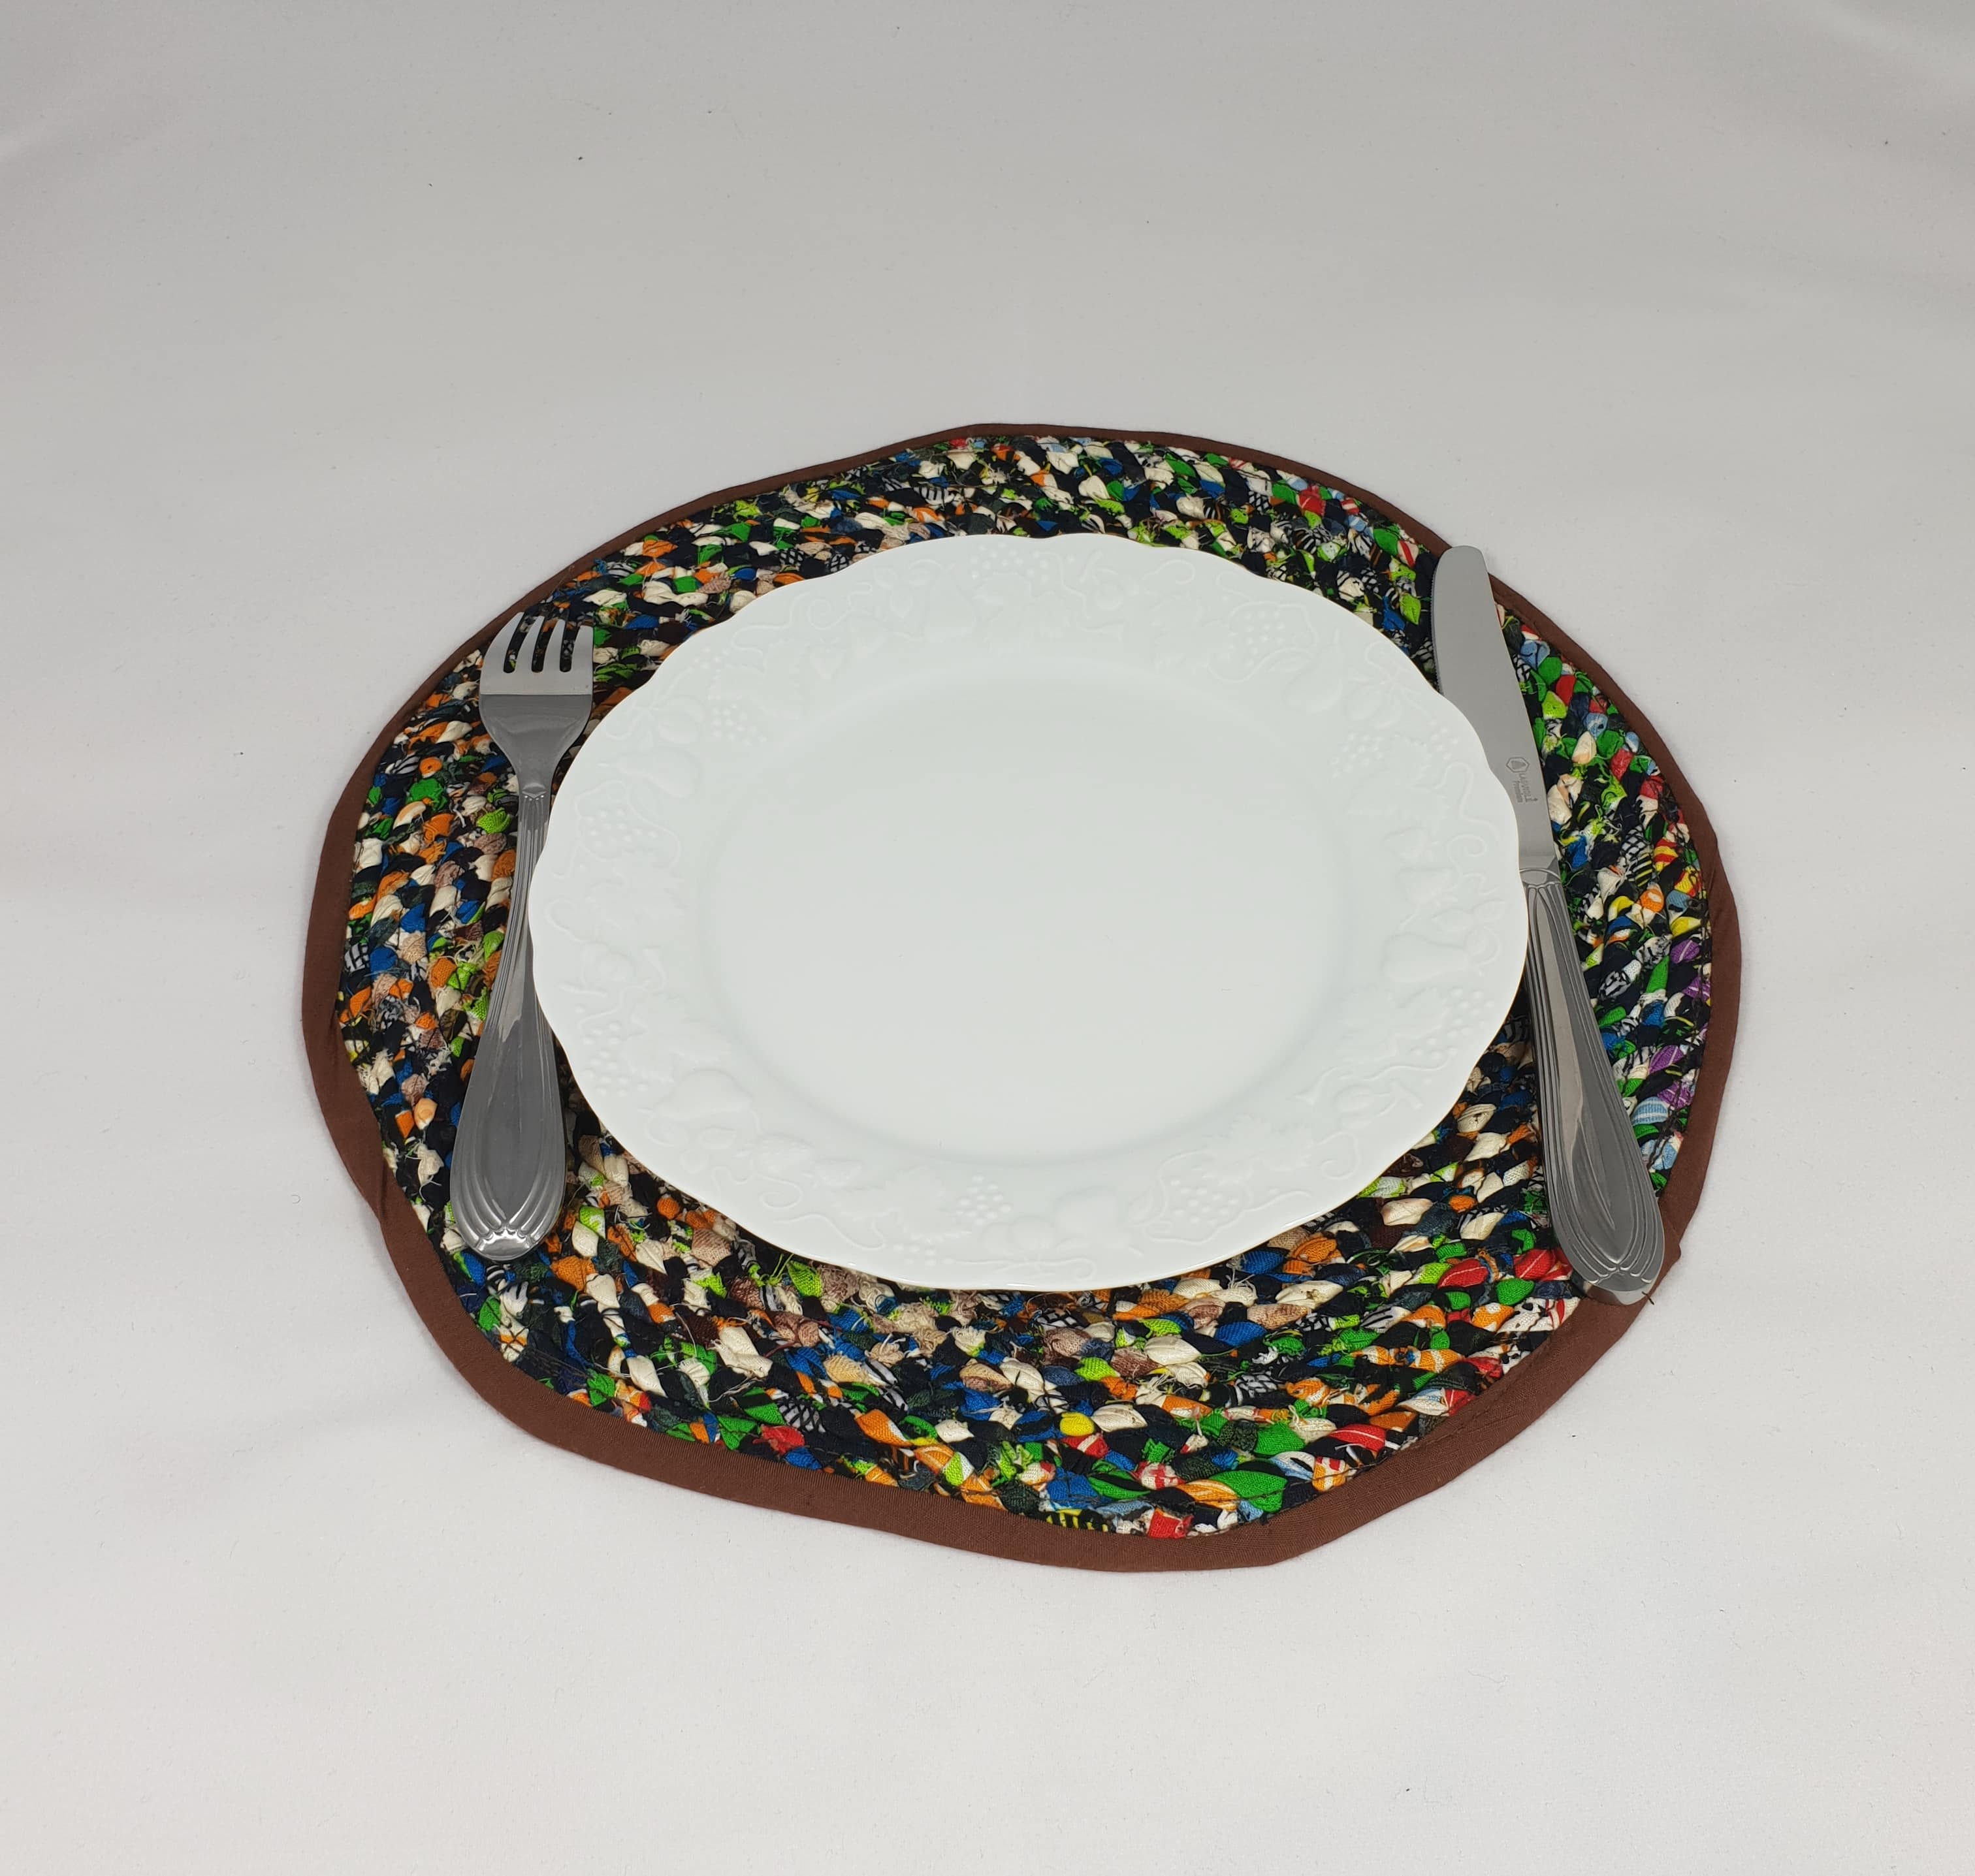 sets de table en tissus recycl s lot de 2 african art. Black Bedroom Furniture Sets. Home Design Ideas